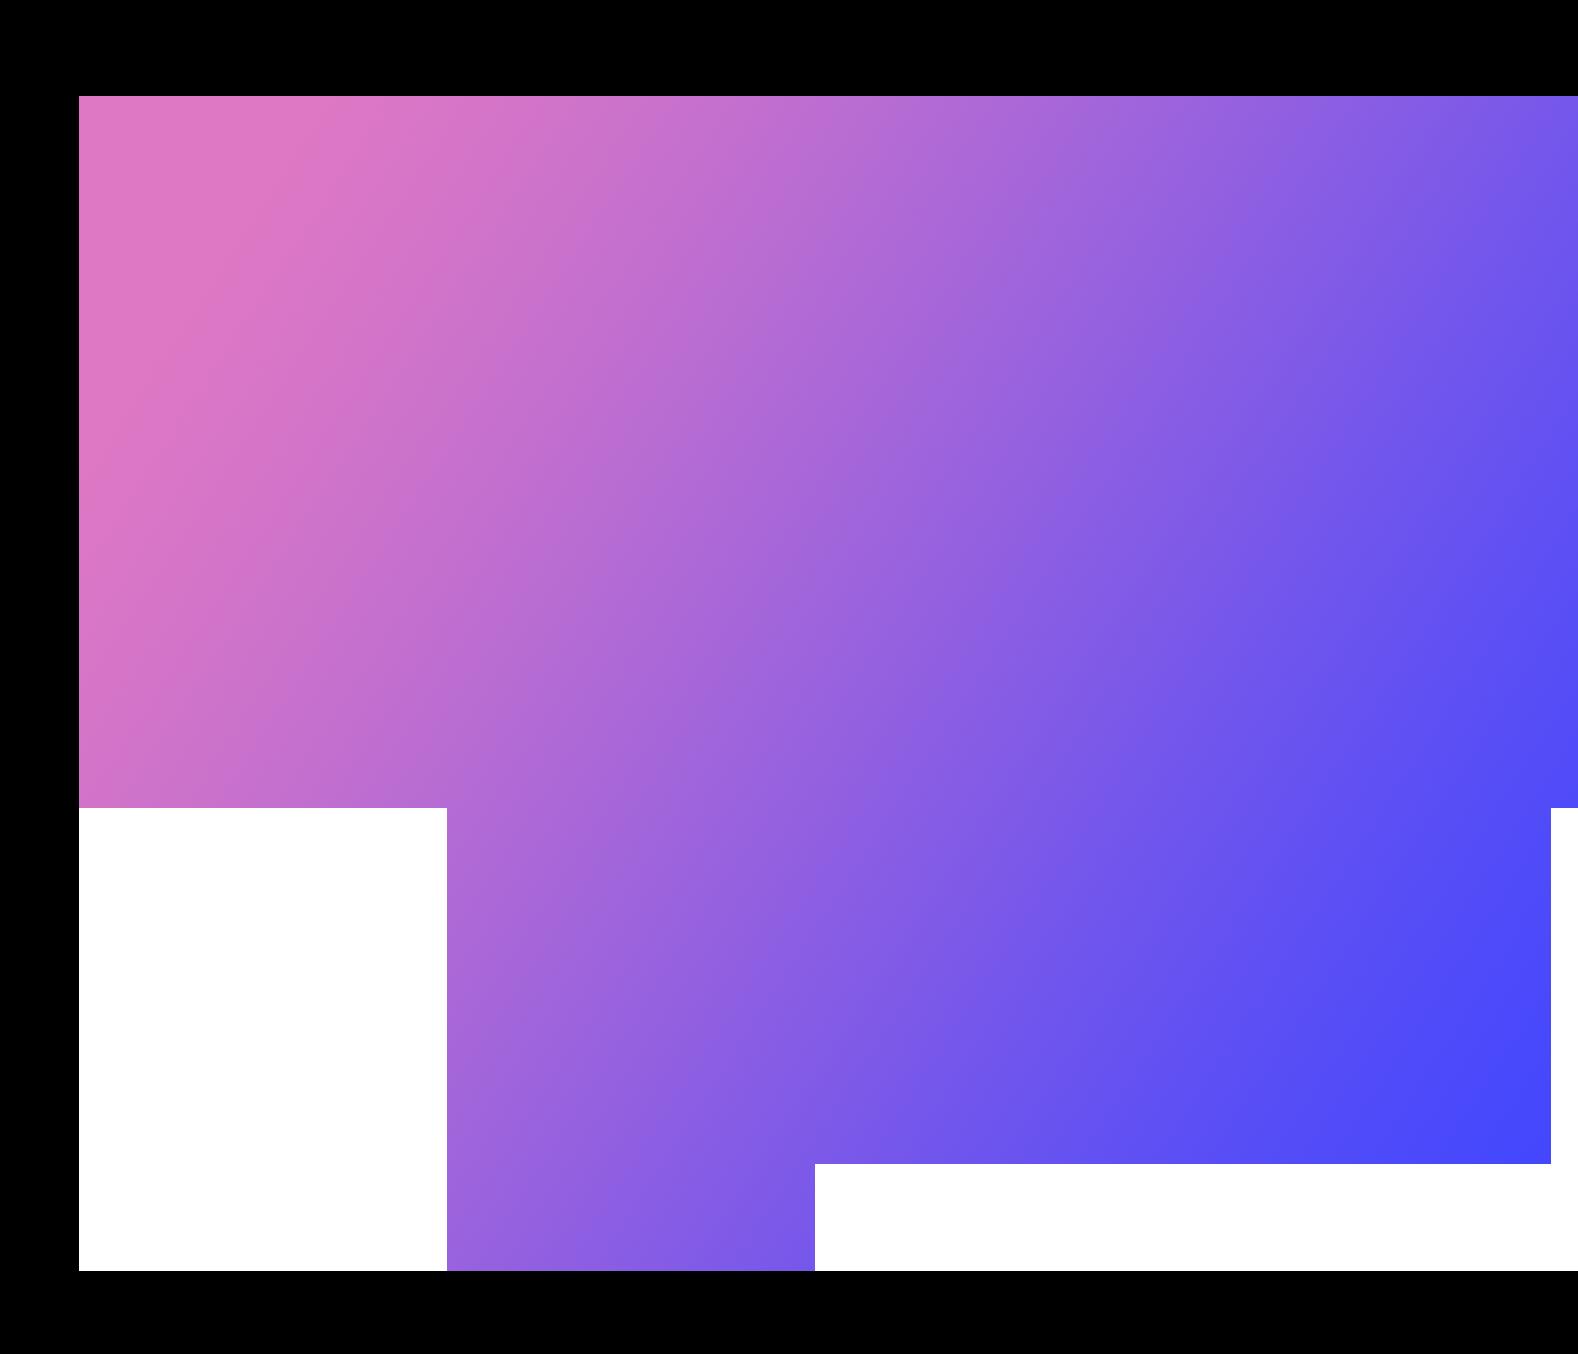 map-Jul-09-2020-08-02-07-39-PM